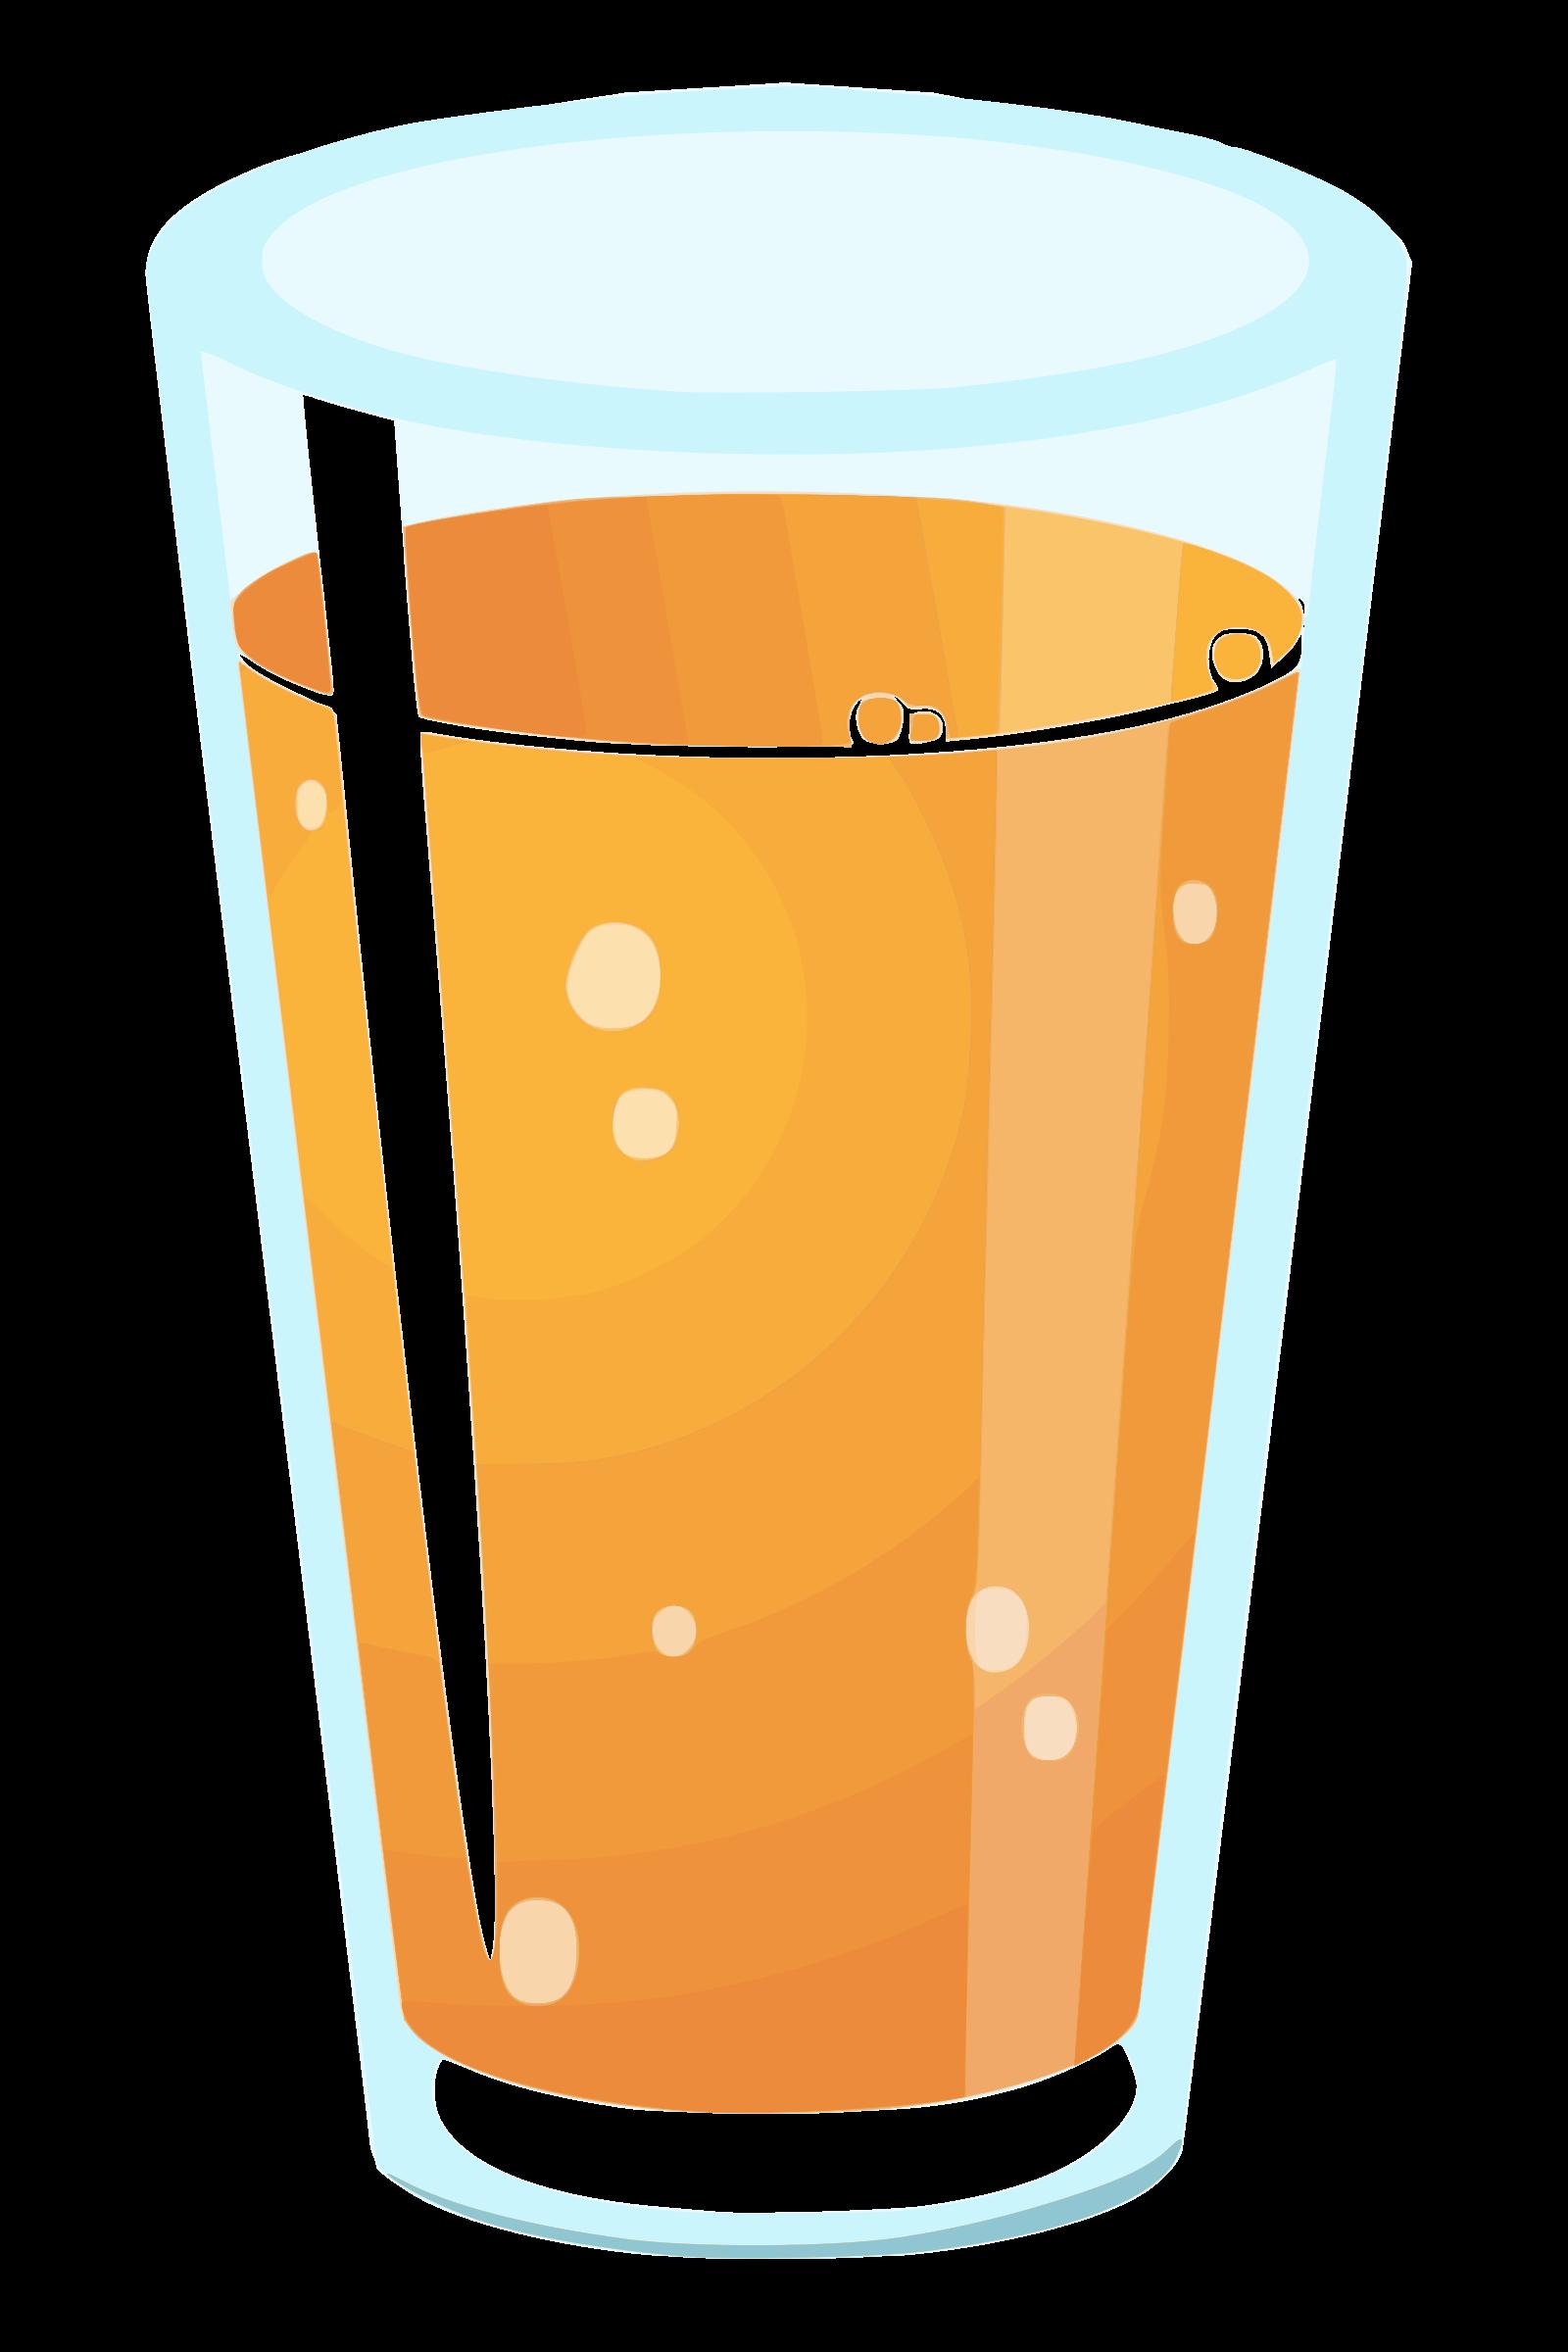 Orange glitch big image. Juice clipart water melon